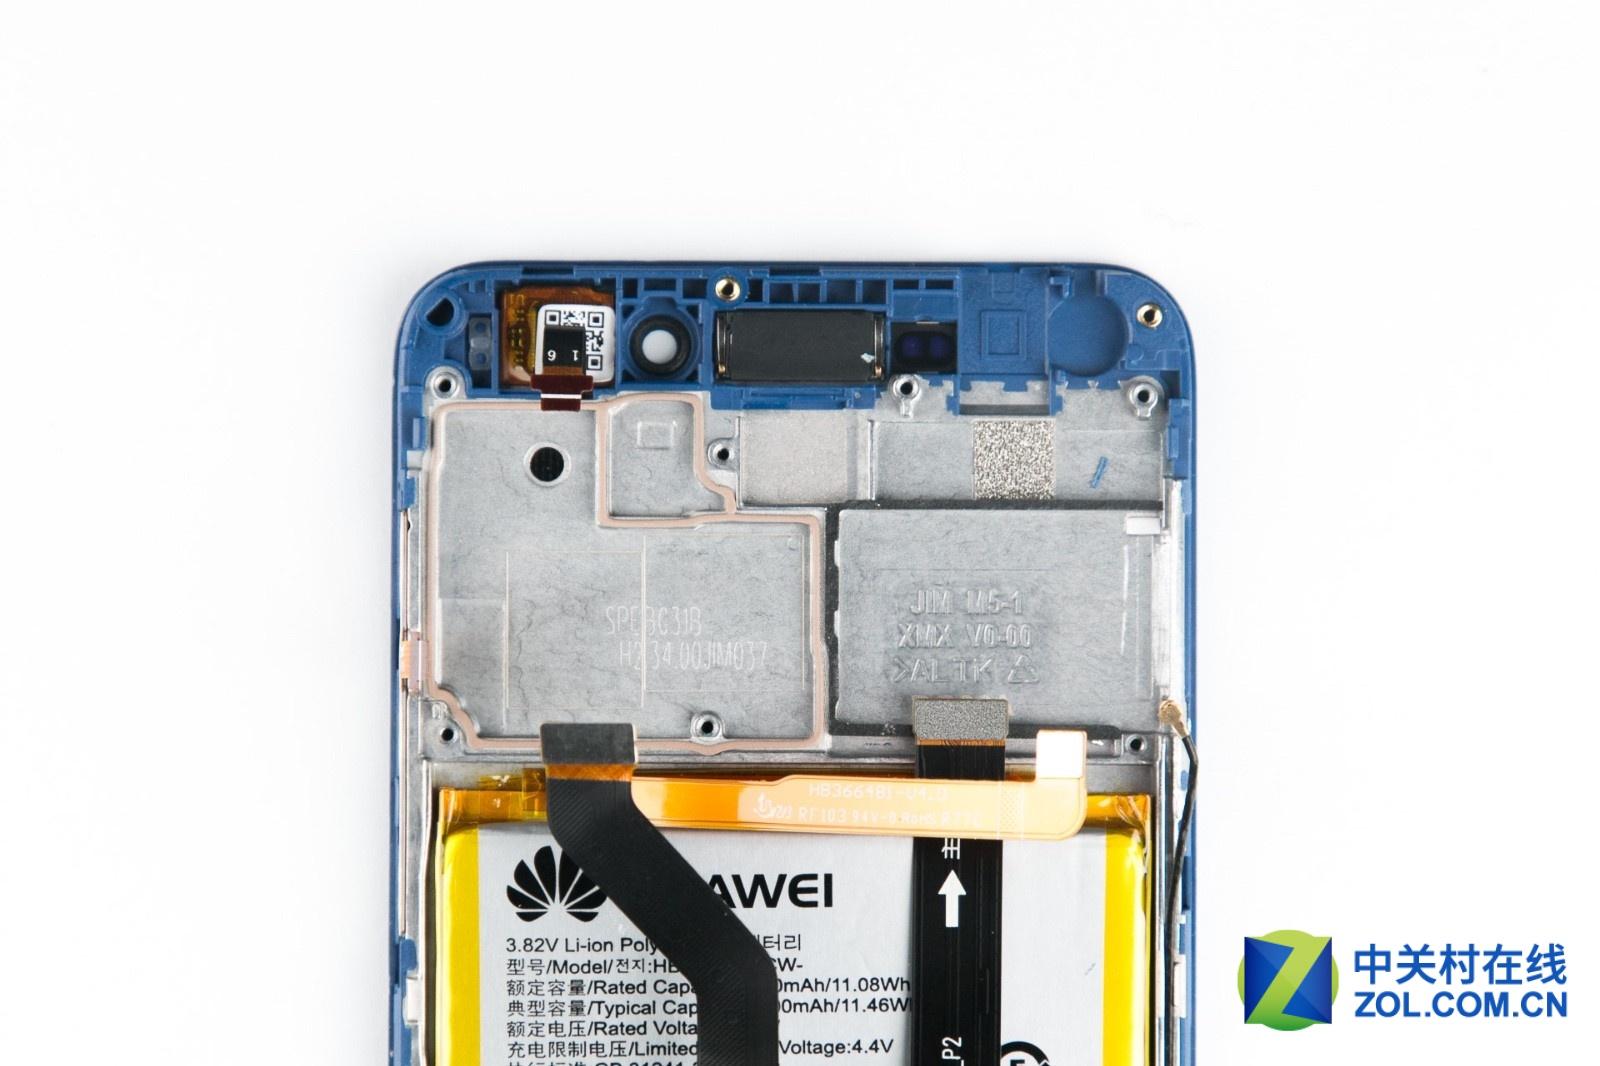 Huawei Honor V9 Play Teardown - Laptopmain com